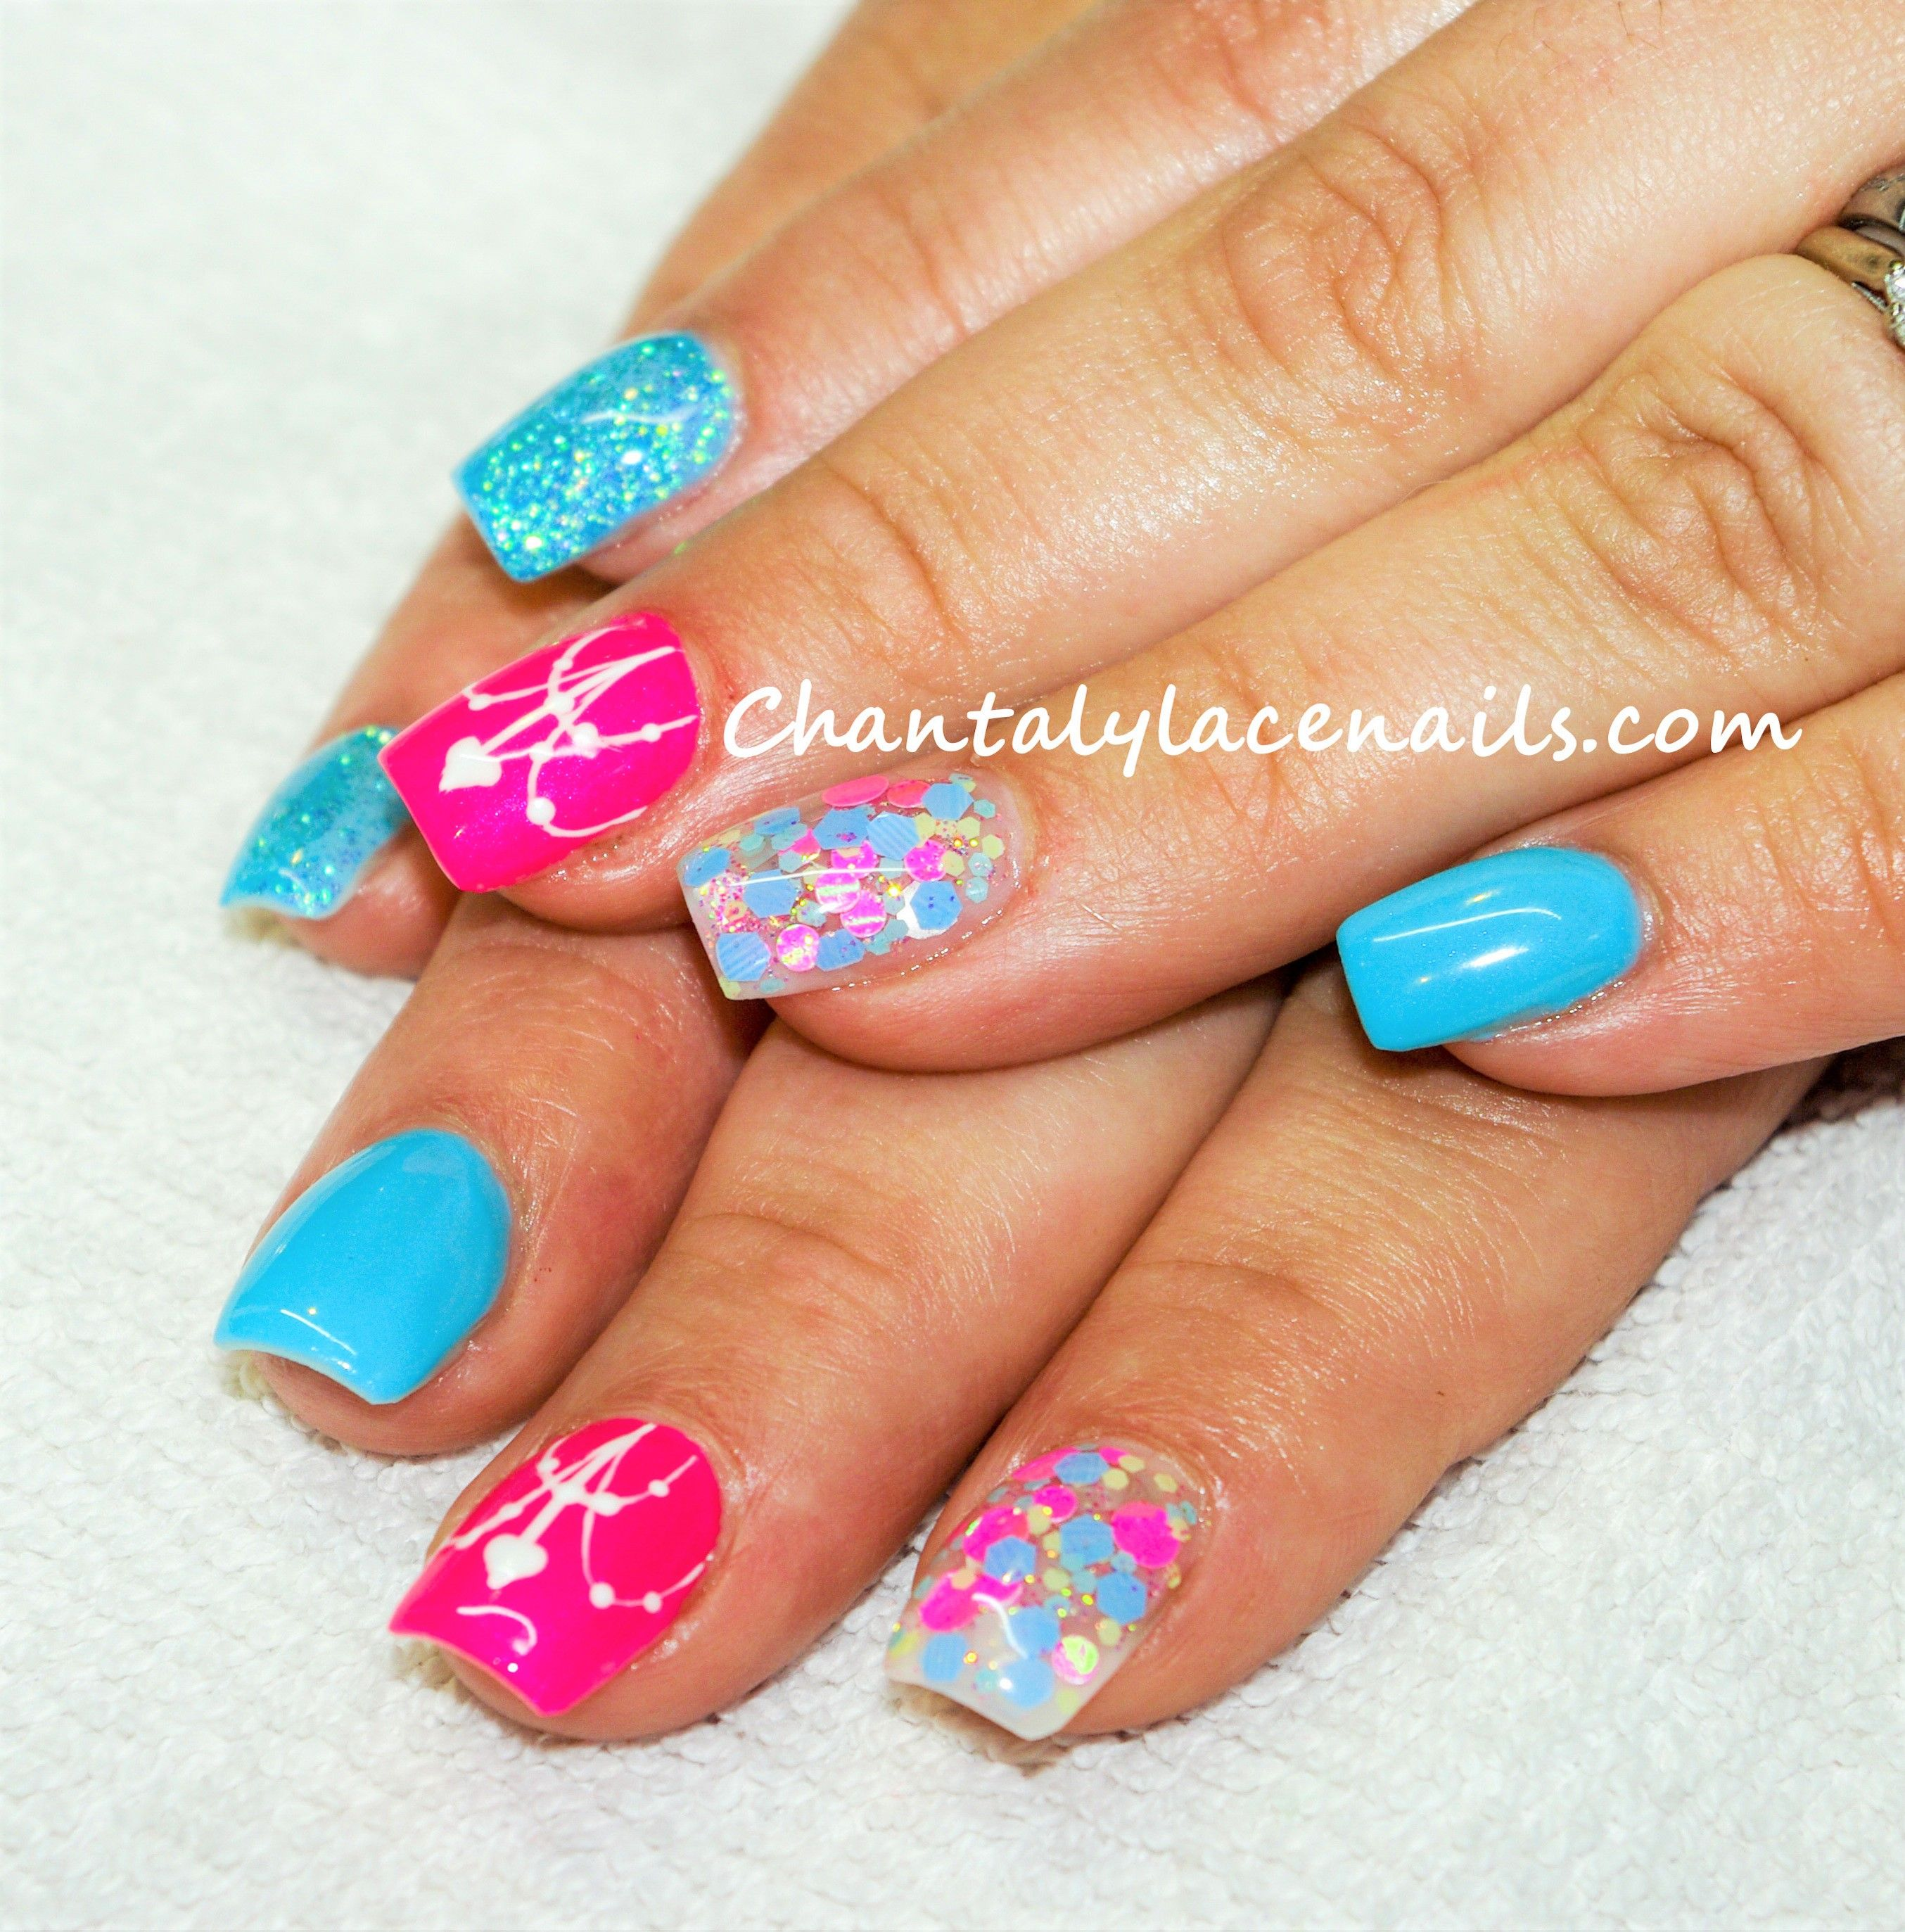 Bright Pink And Blue Nails Confetti Nails Confetti Nails Bright Blue Nails Bright Pink Nails